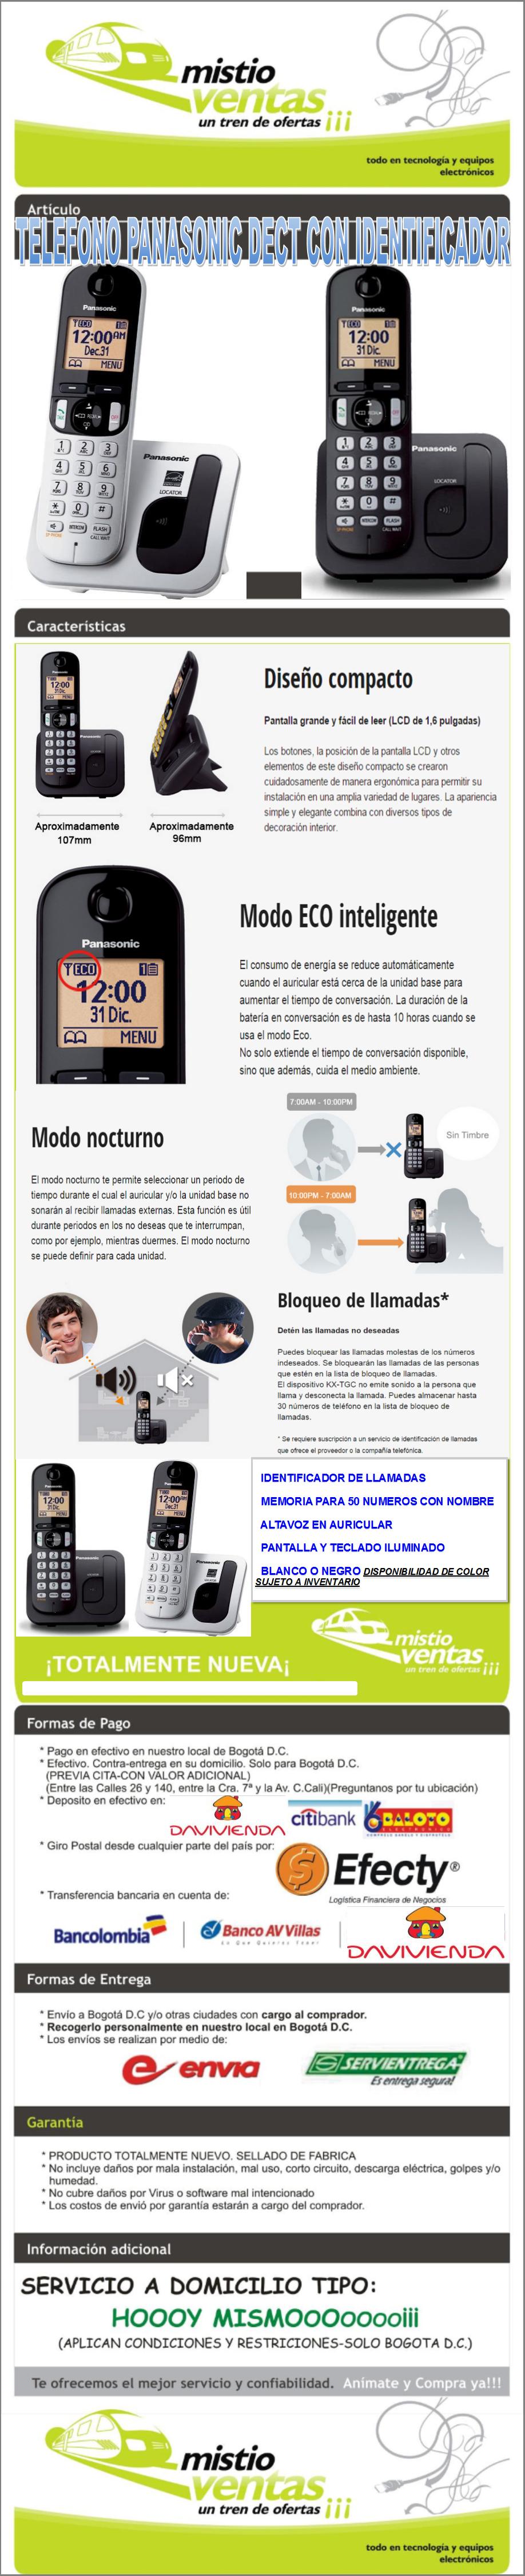 TELÉFONO PANASONIC DECT CON IDENTIFICADOR MISTIOVENTAS